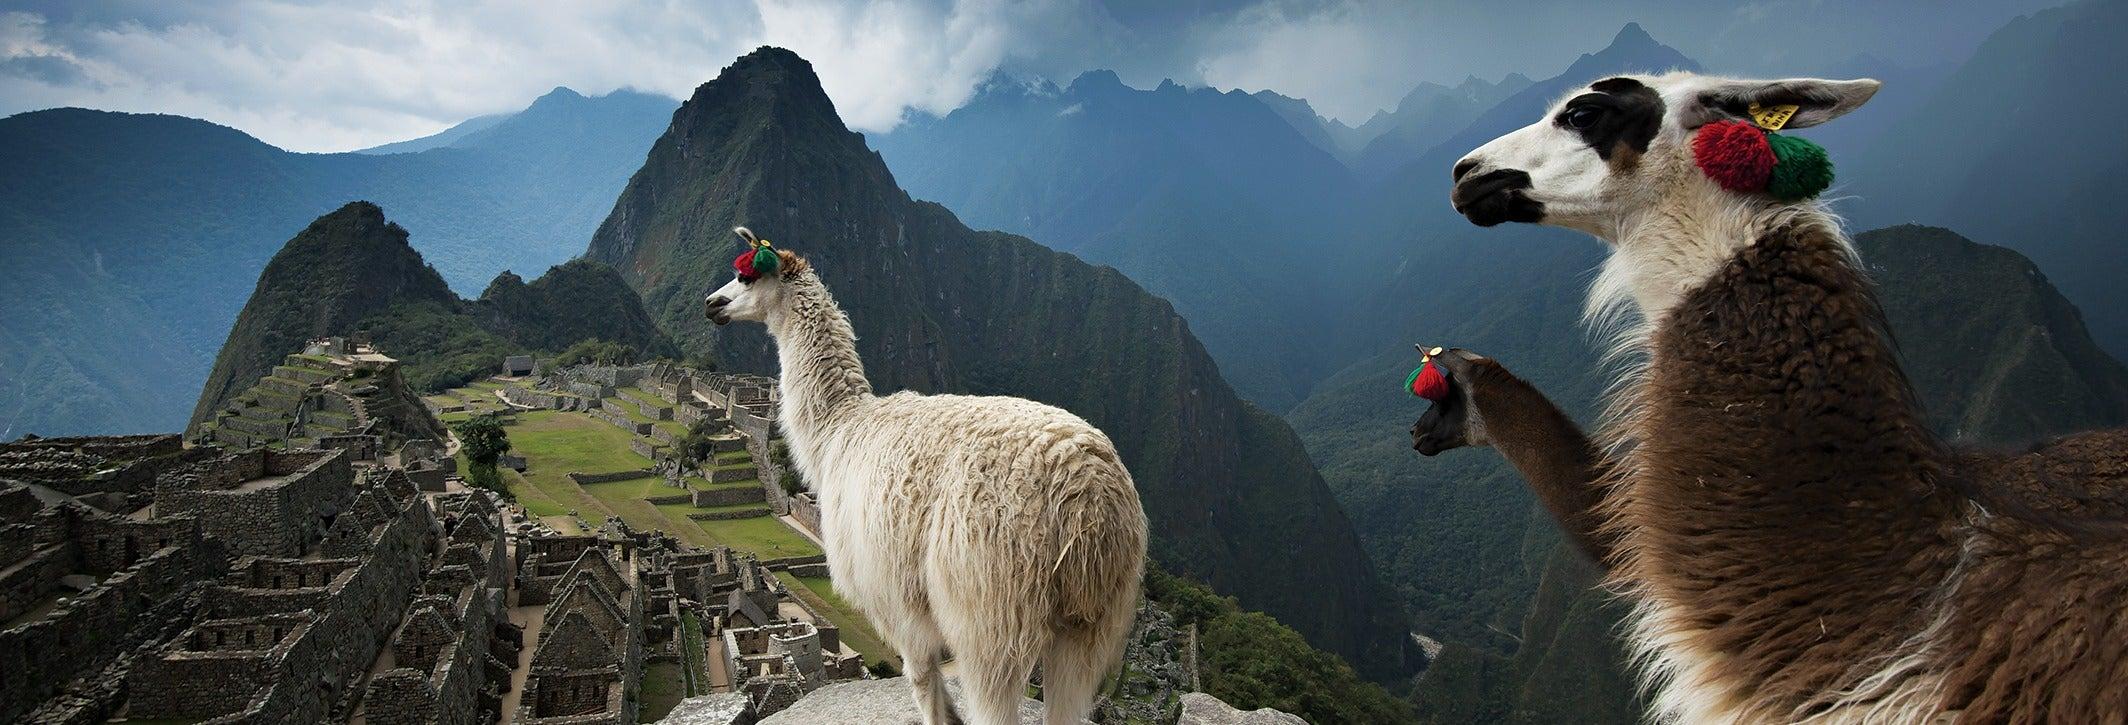 Selva de Machu Picchu, Valle Sagrado y Montaña Arcoíris en 6 días